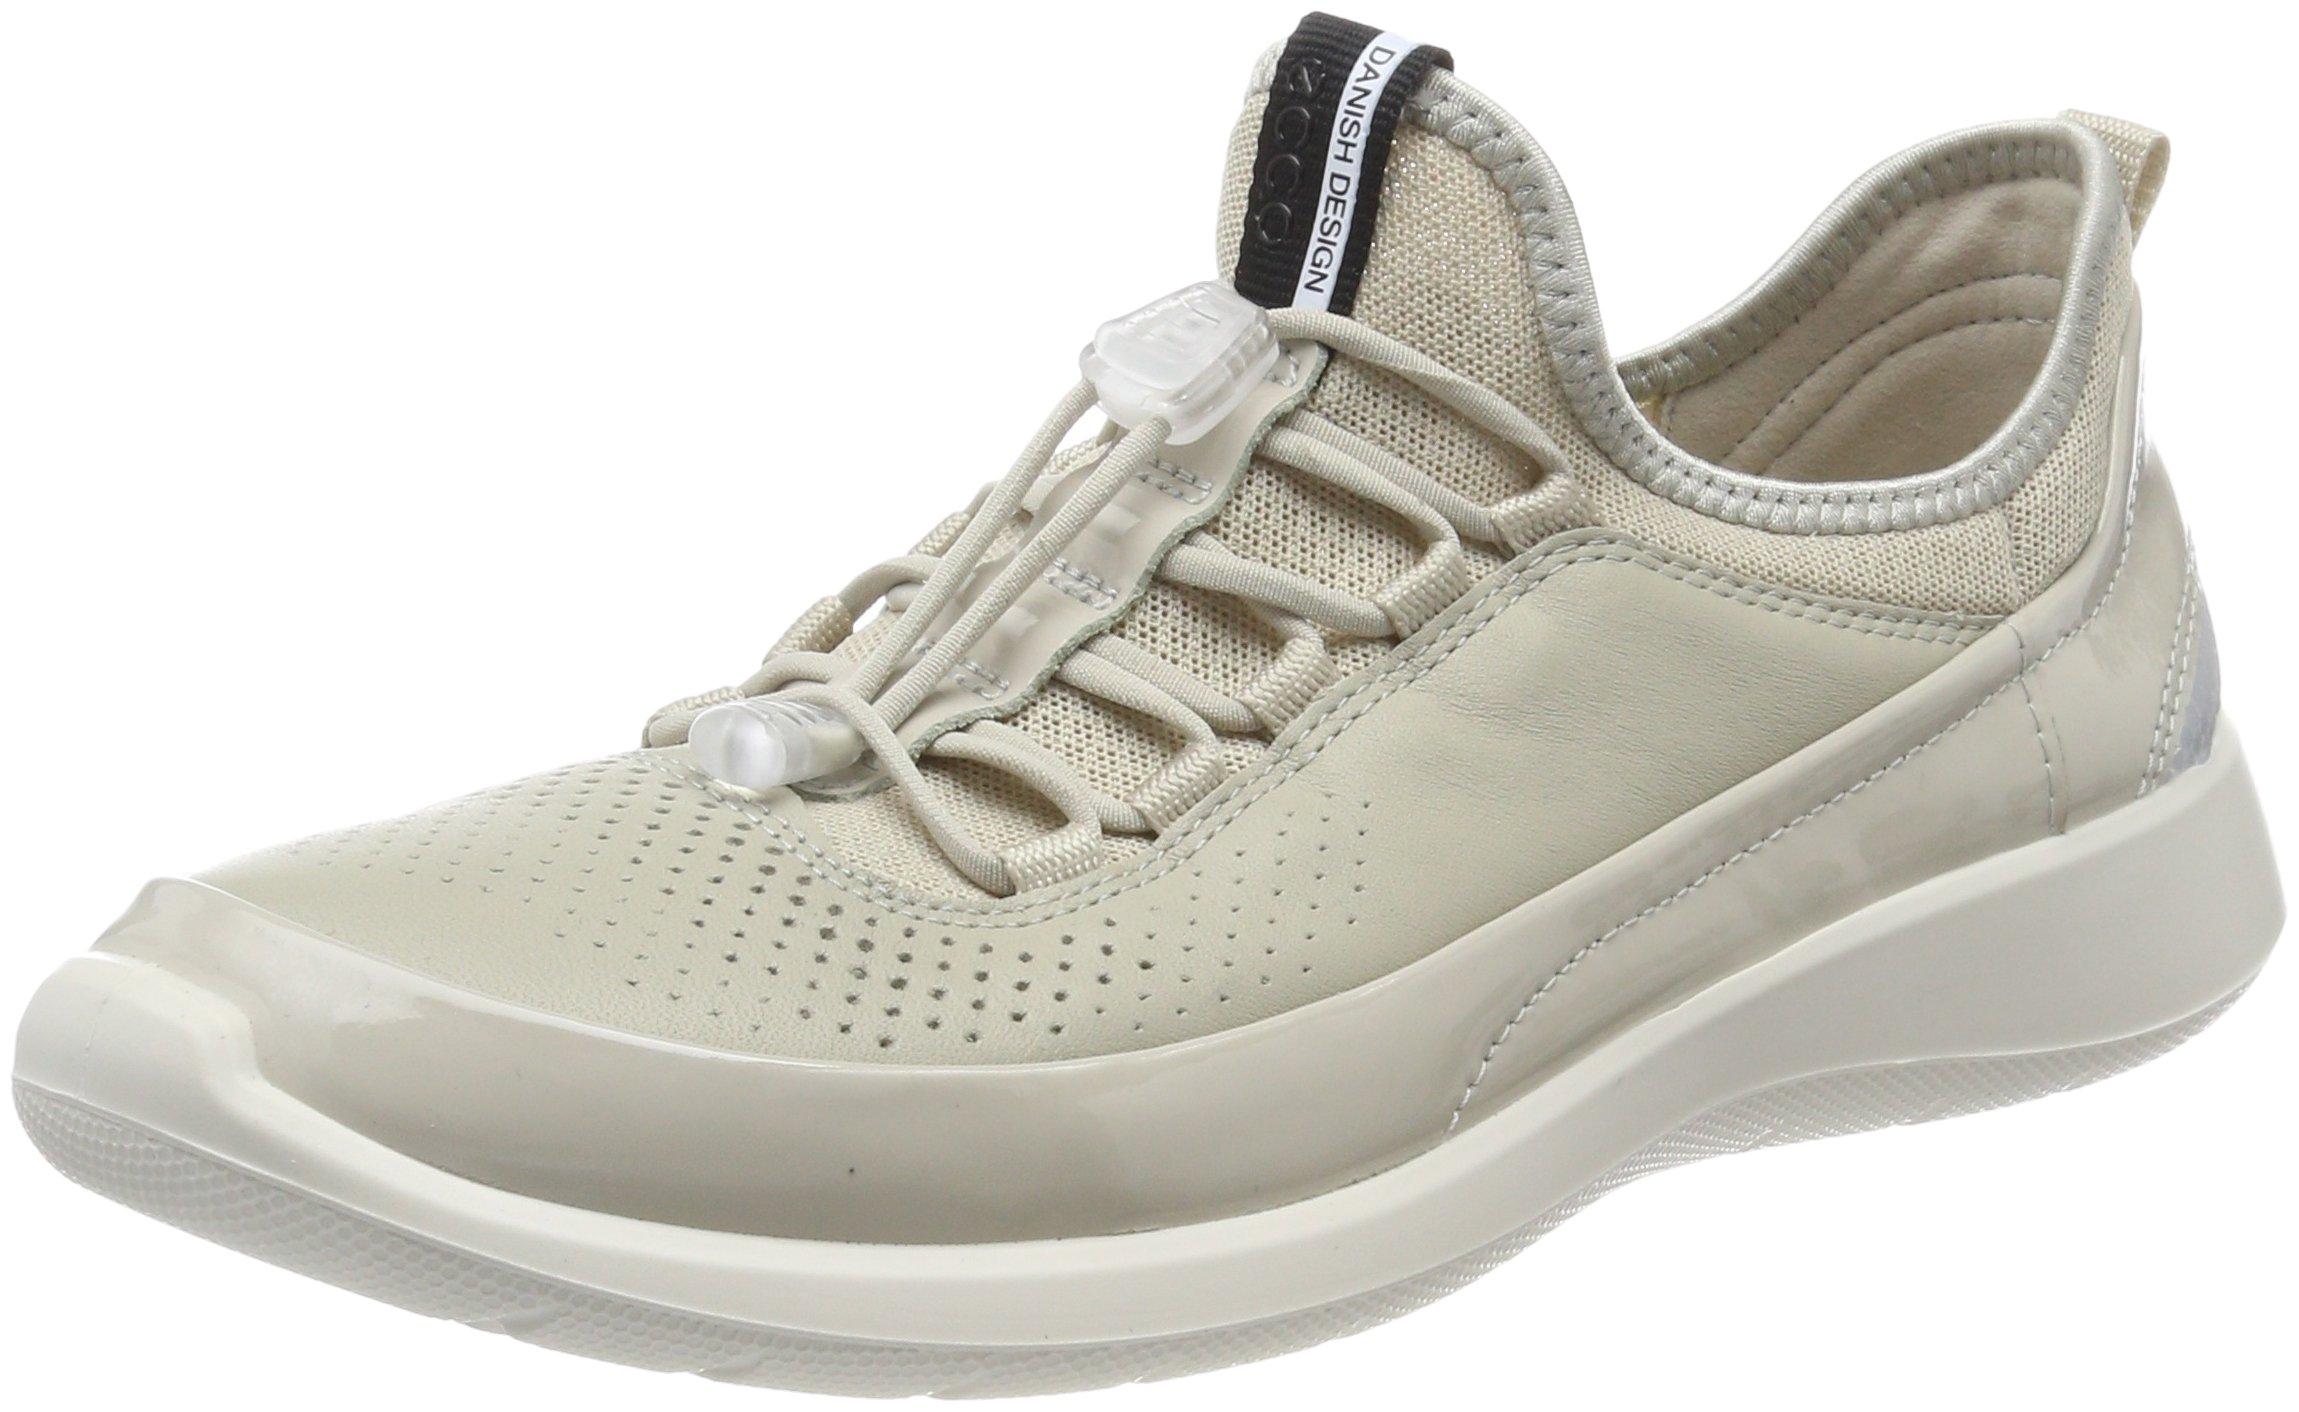 Basses Eu Soft FemmeBeige 5Sneakers Ecco gravel40 Oyster ZOPuikX